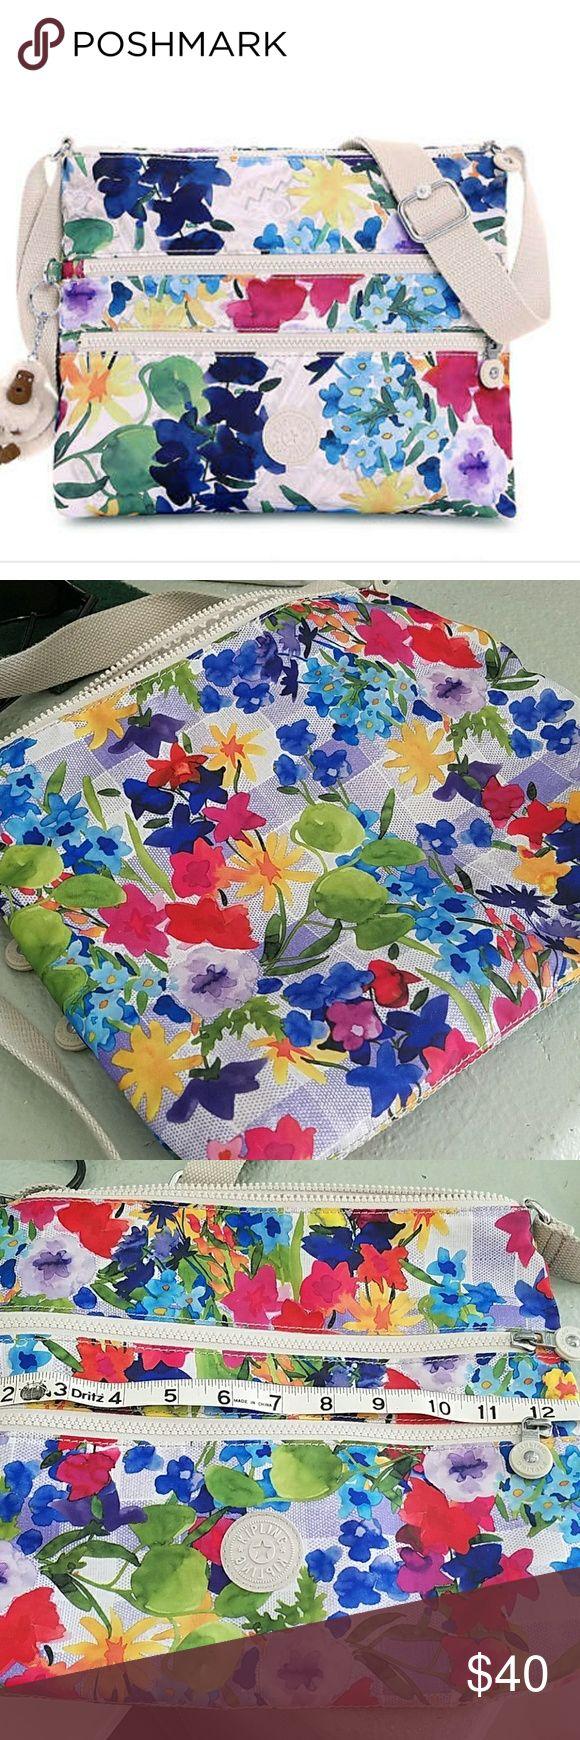 25 best ideas about kipling backpack on pinterest school handbags - Kipling Cross Body Bag